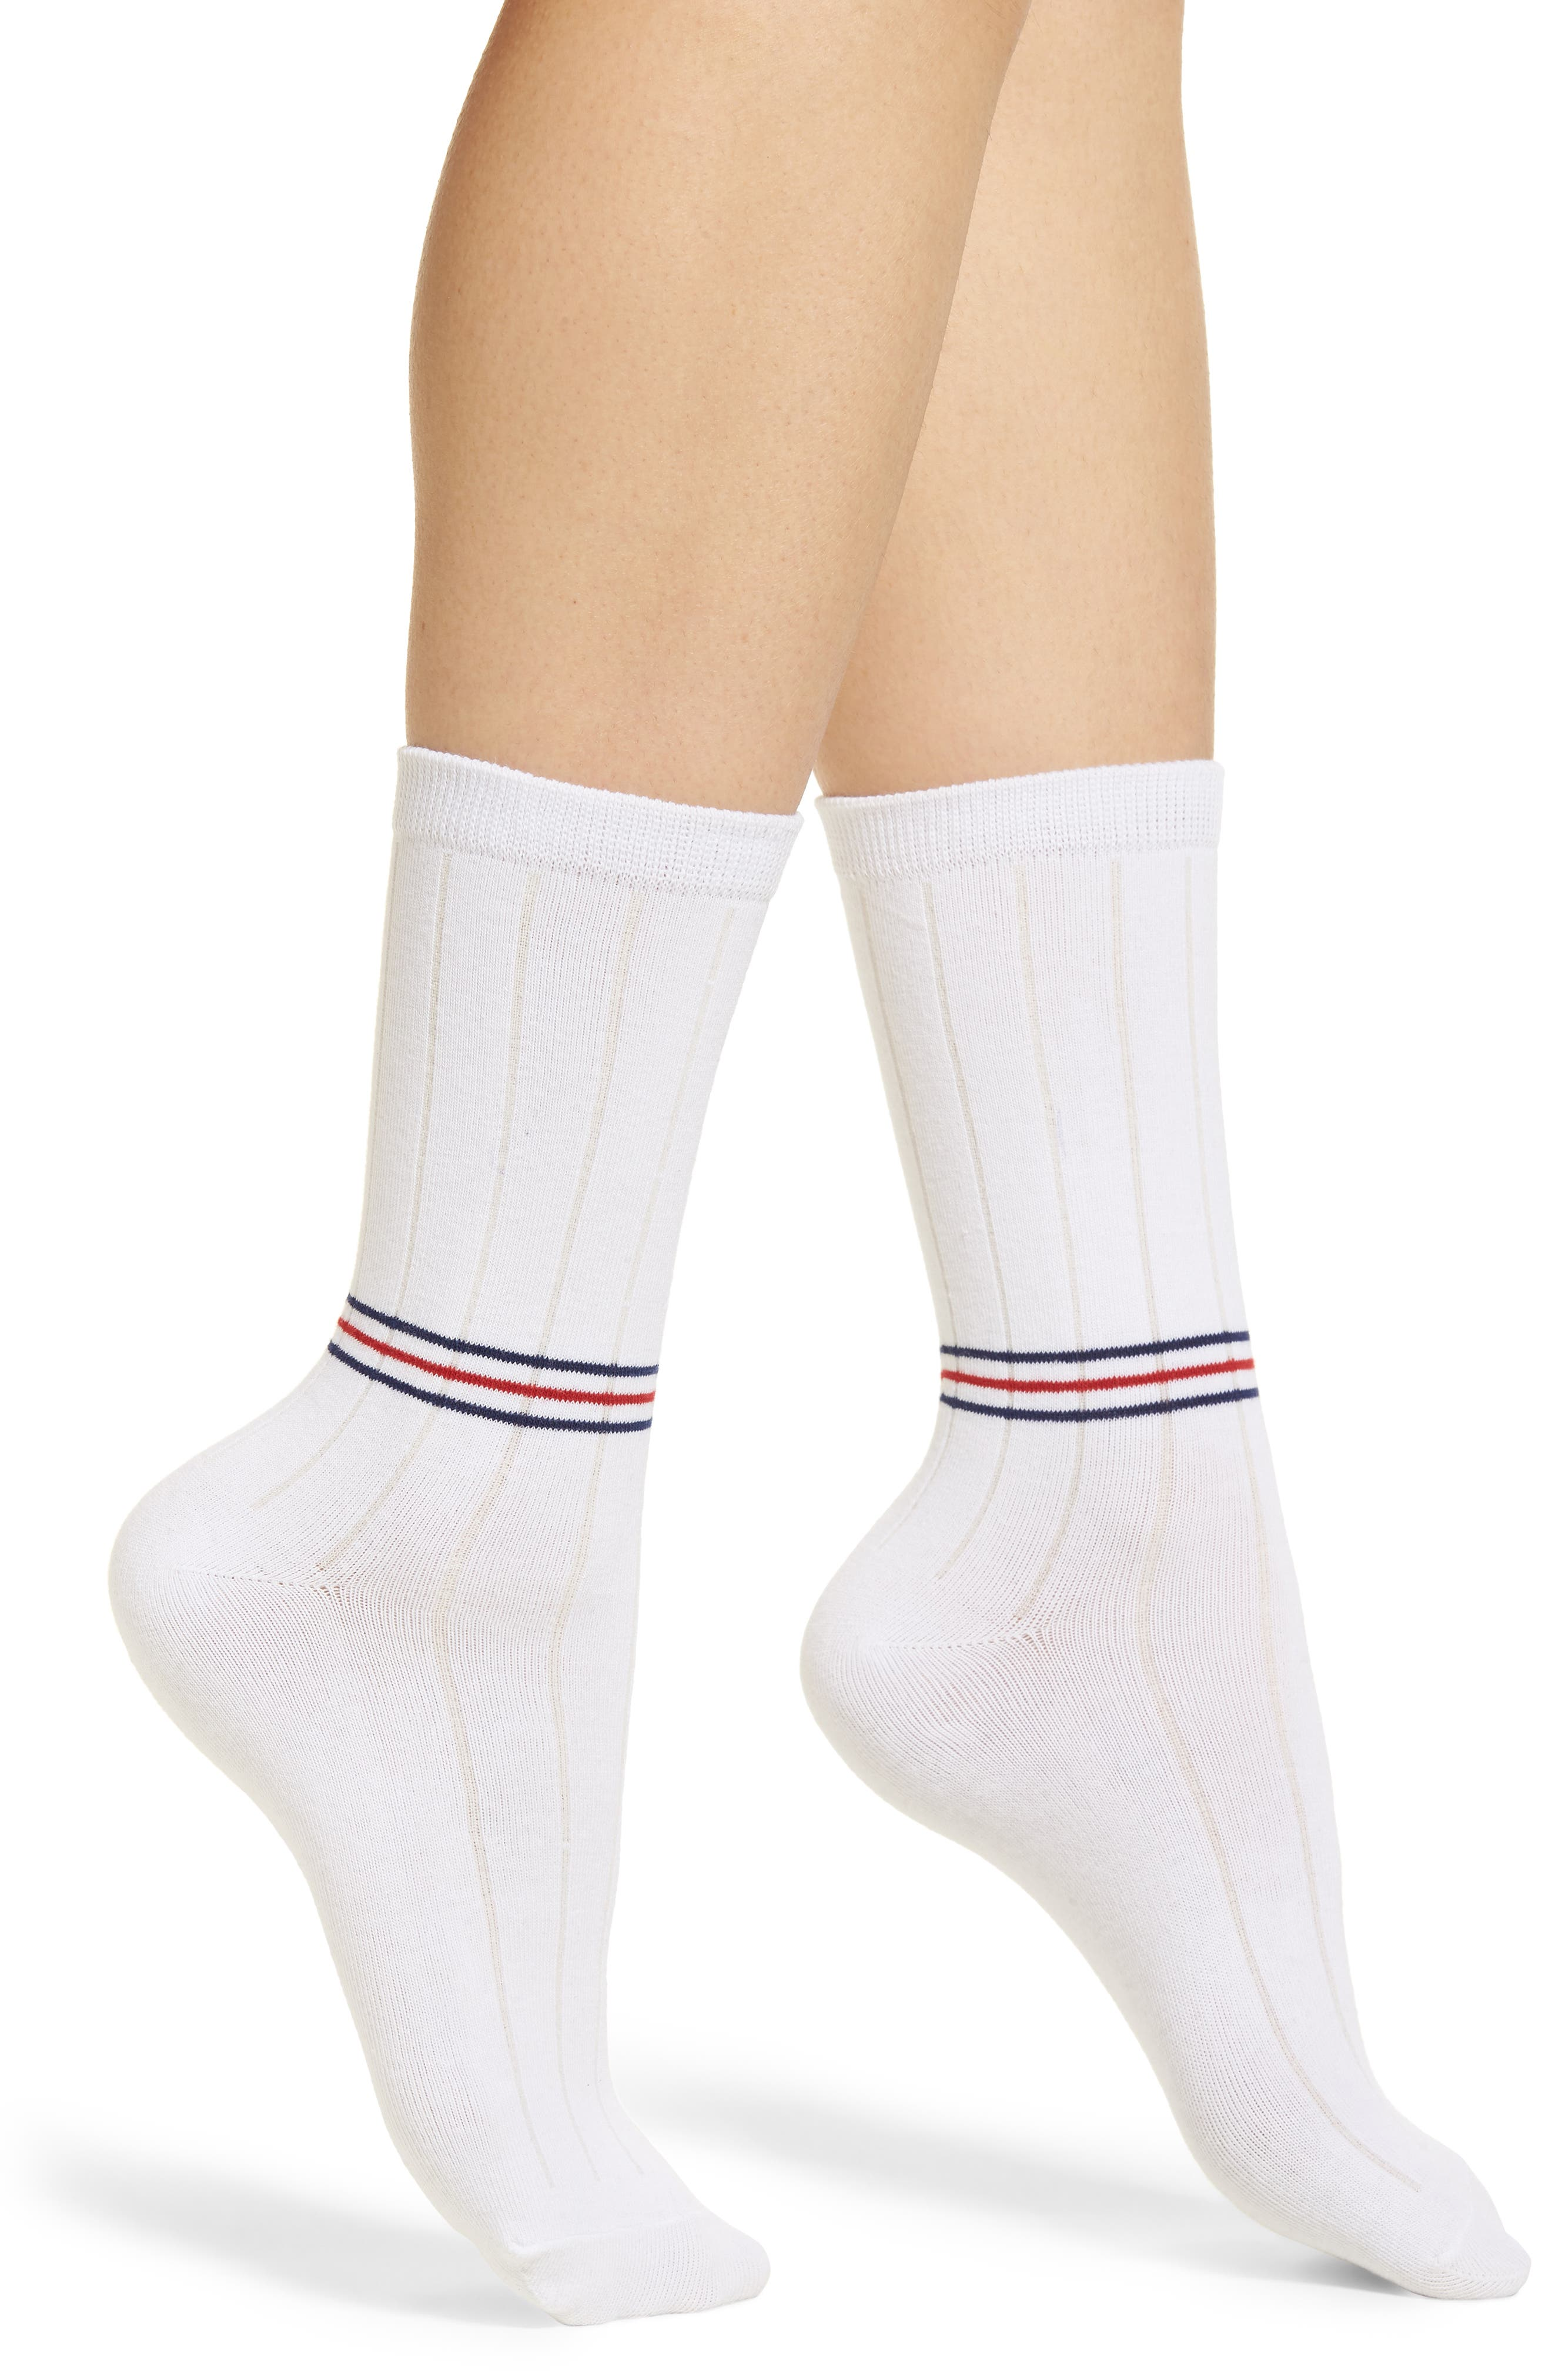 Richer Poorer Rocky Classic Crew Socks